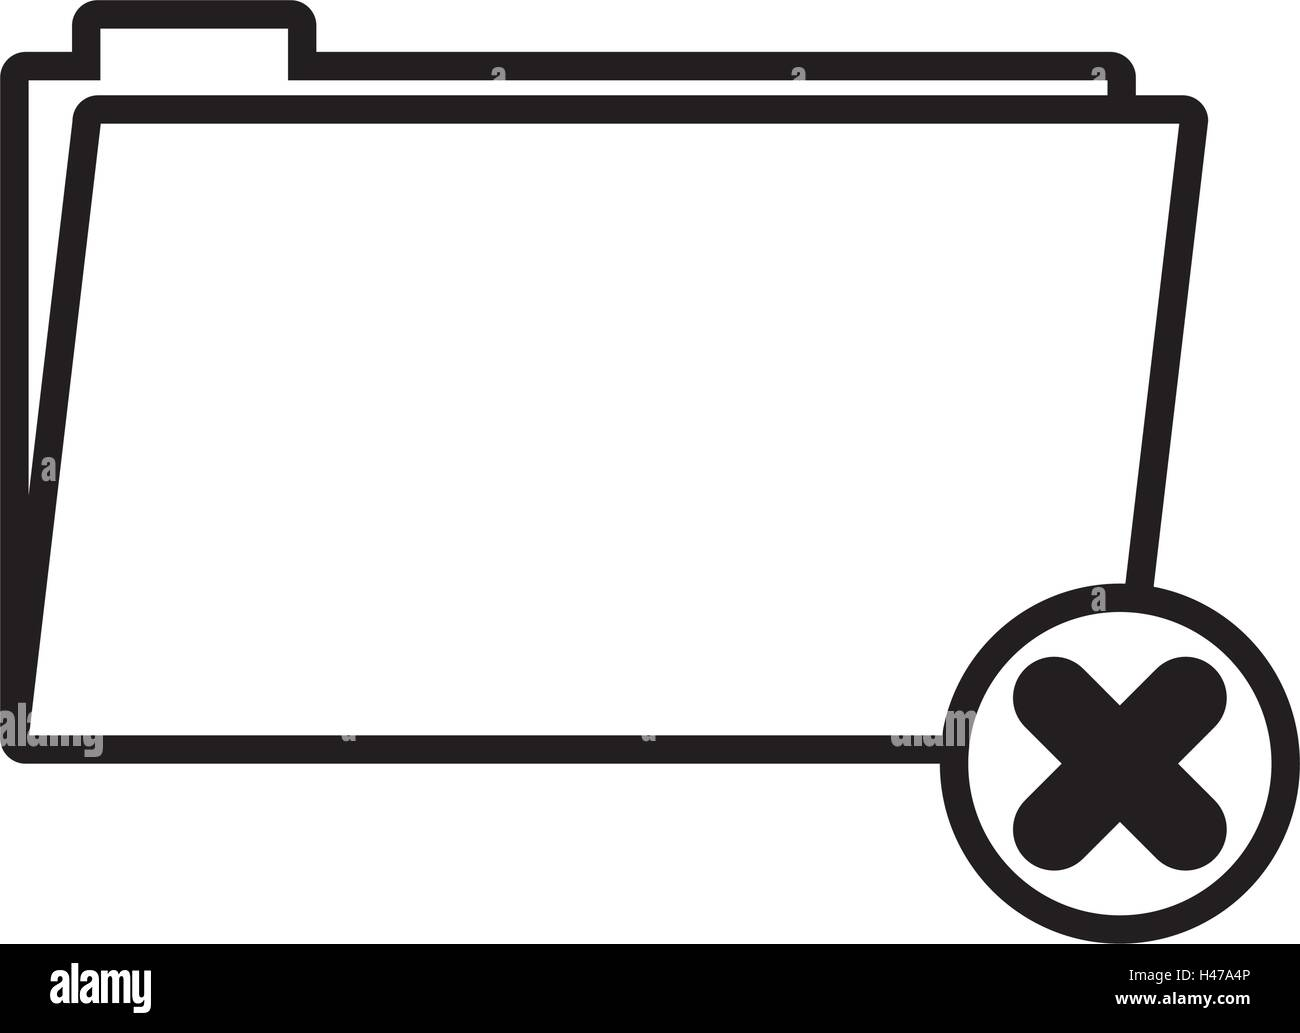 silhouette folder symbol to erased files vector illustration - Stock Vector